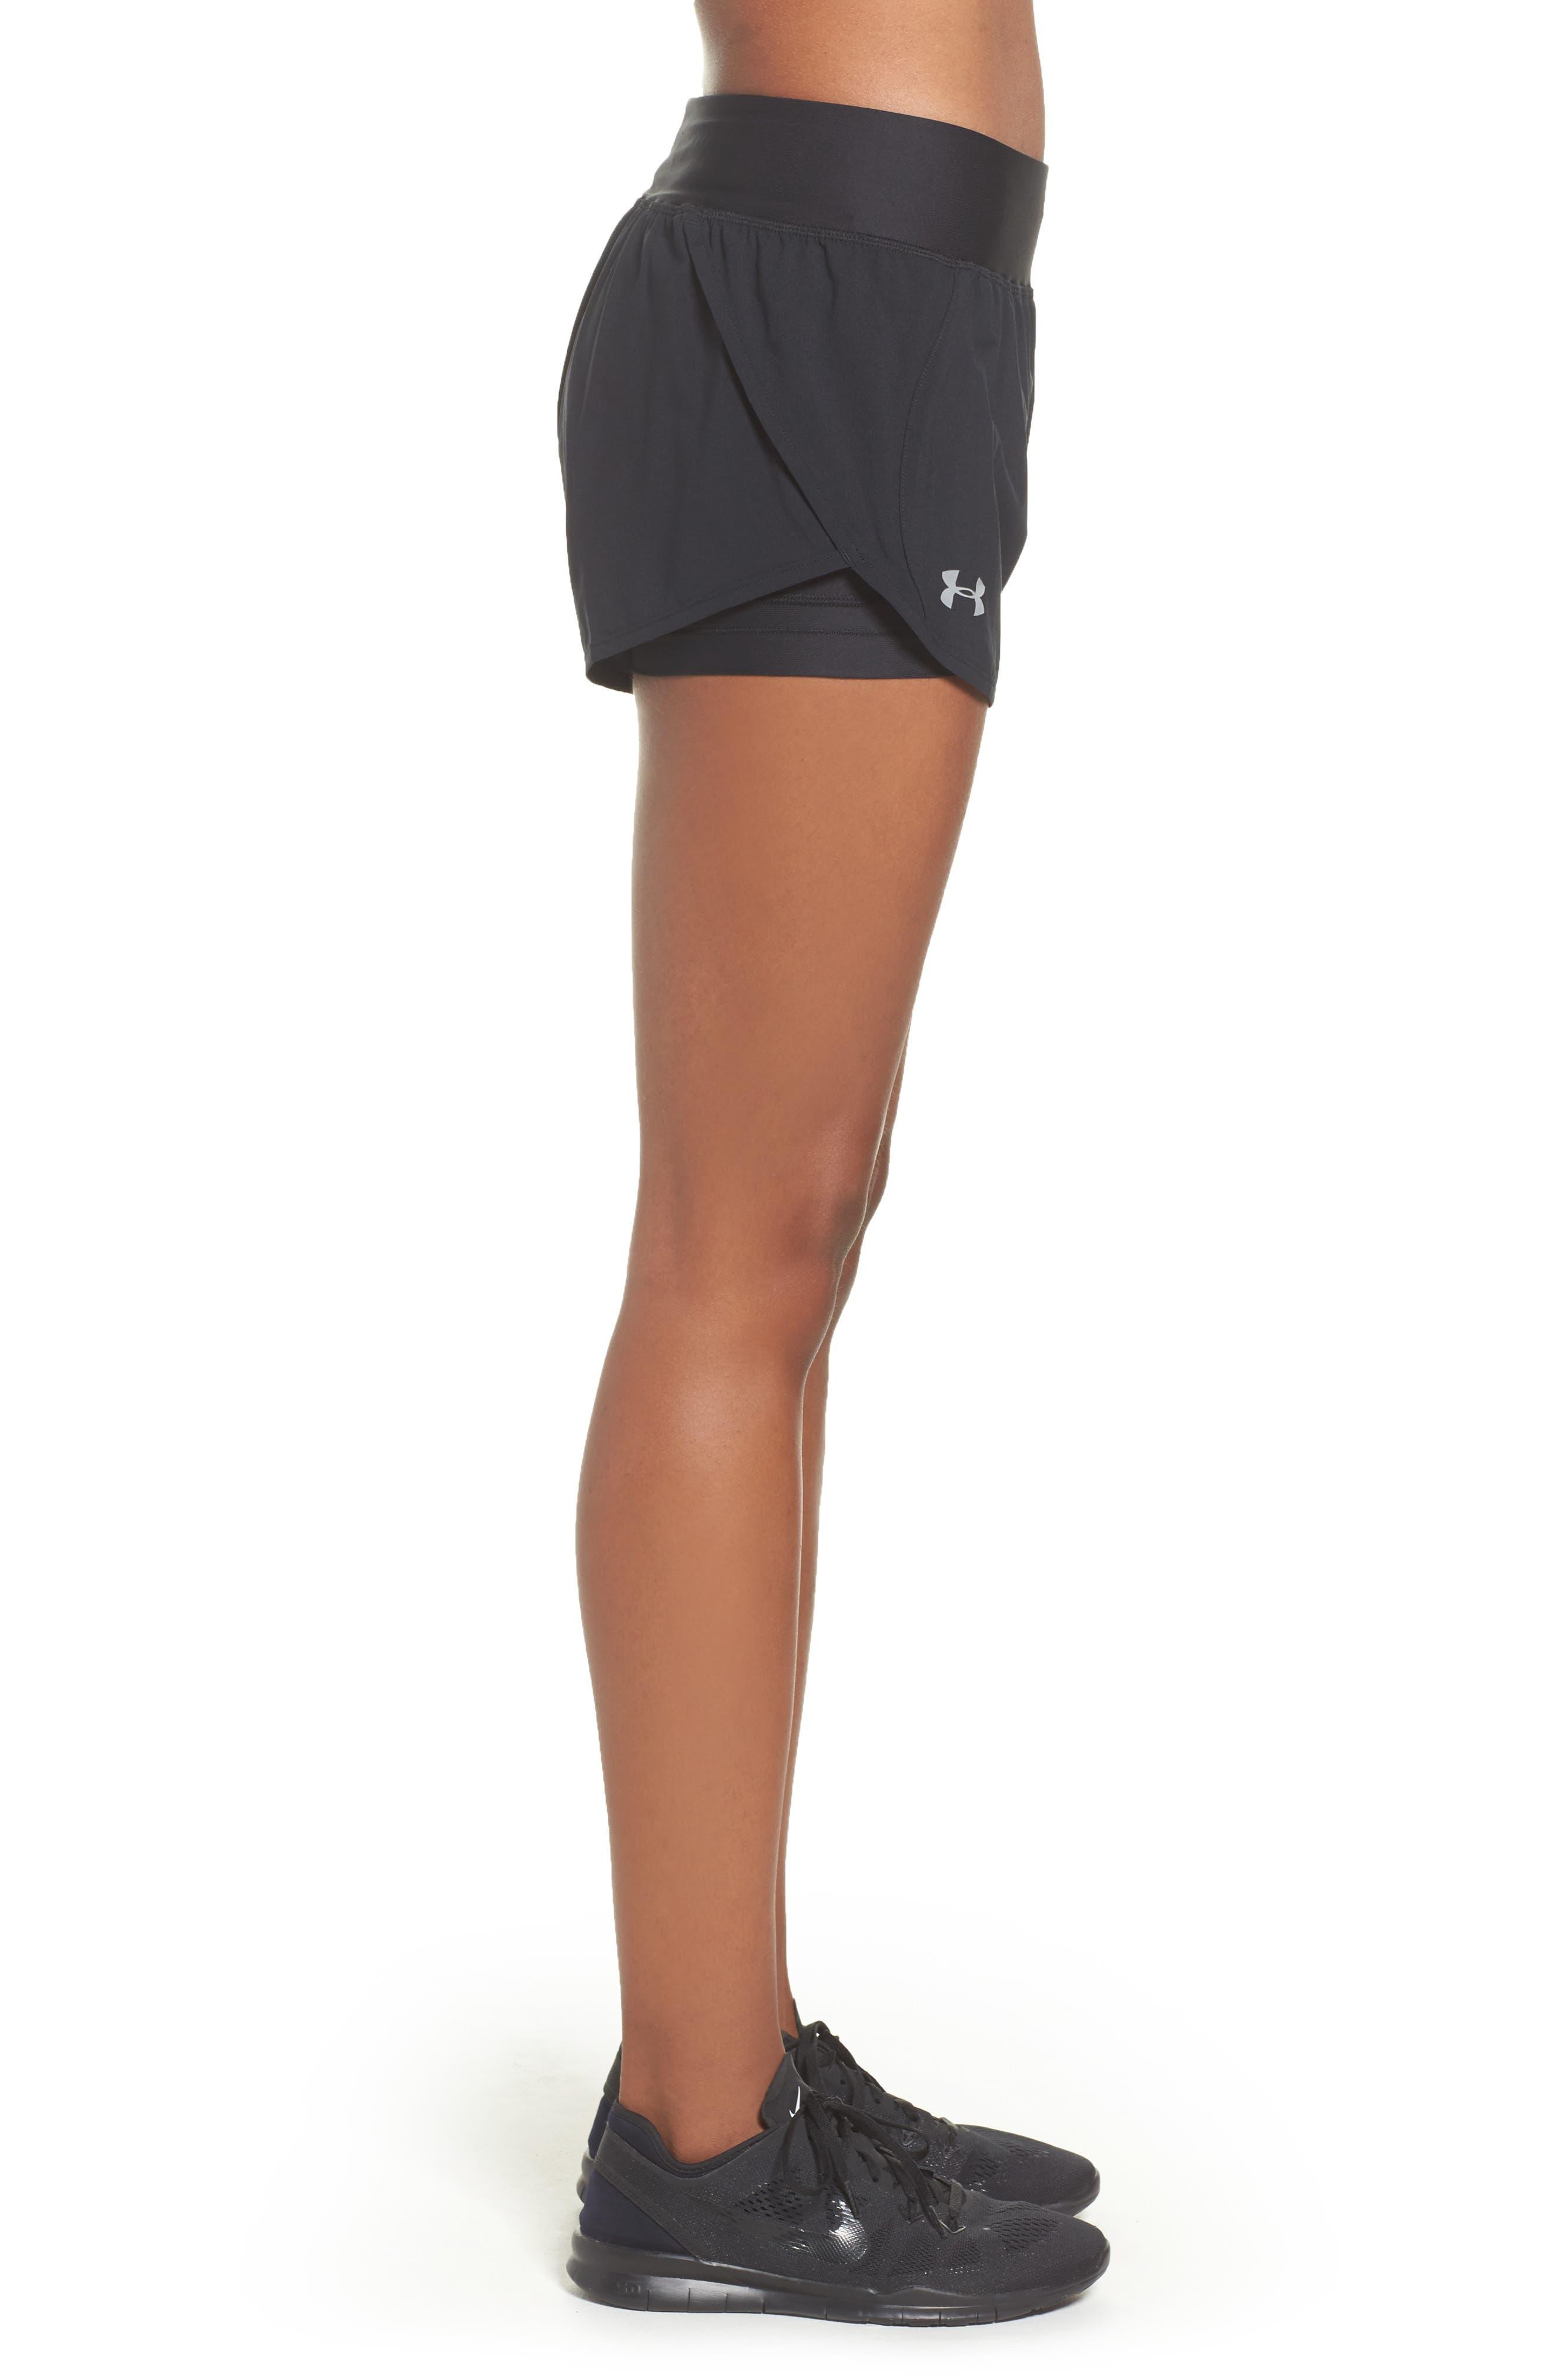 Launch Tulip Running Shorts,                             Alternate thumbnail 3, color,                             Black/ Black/ Reflective